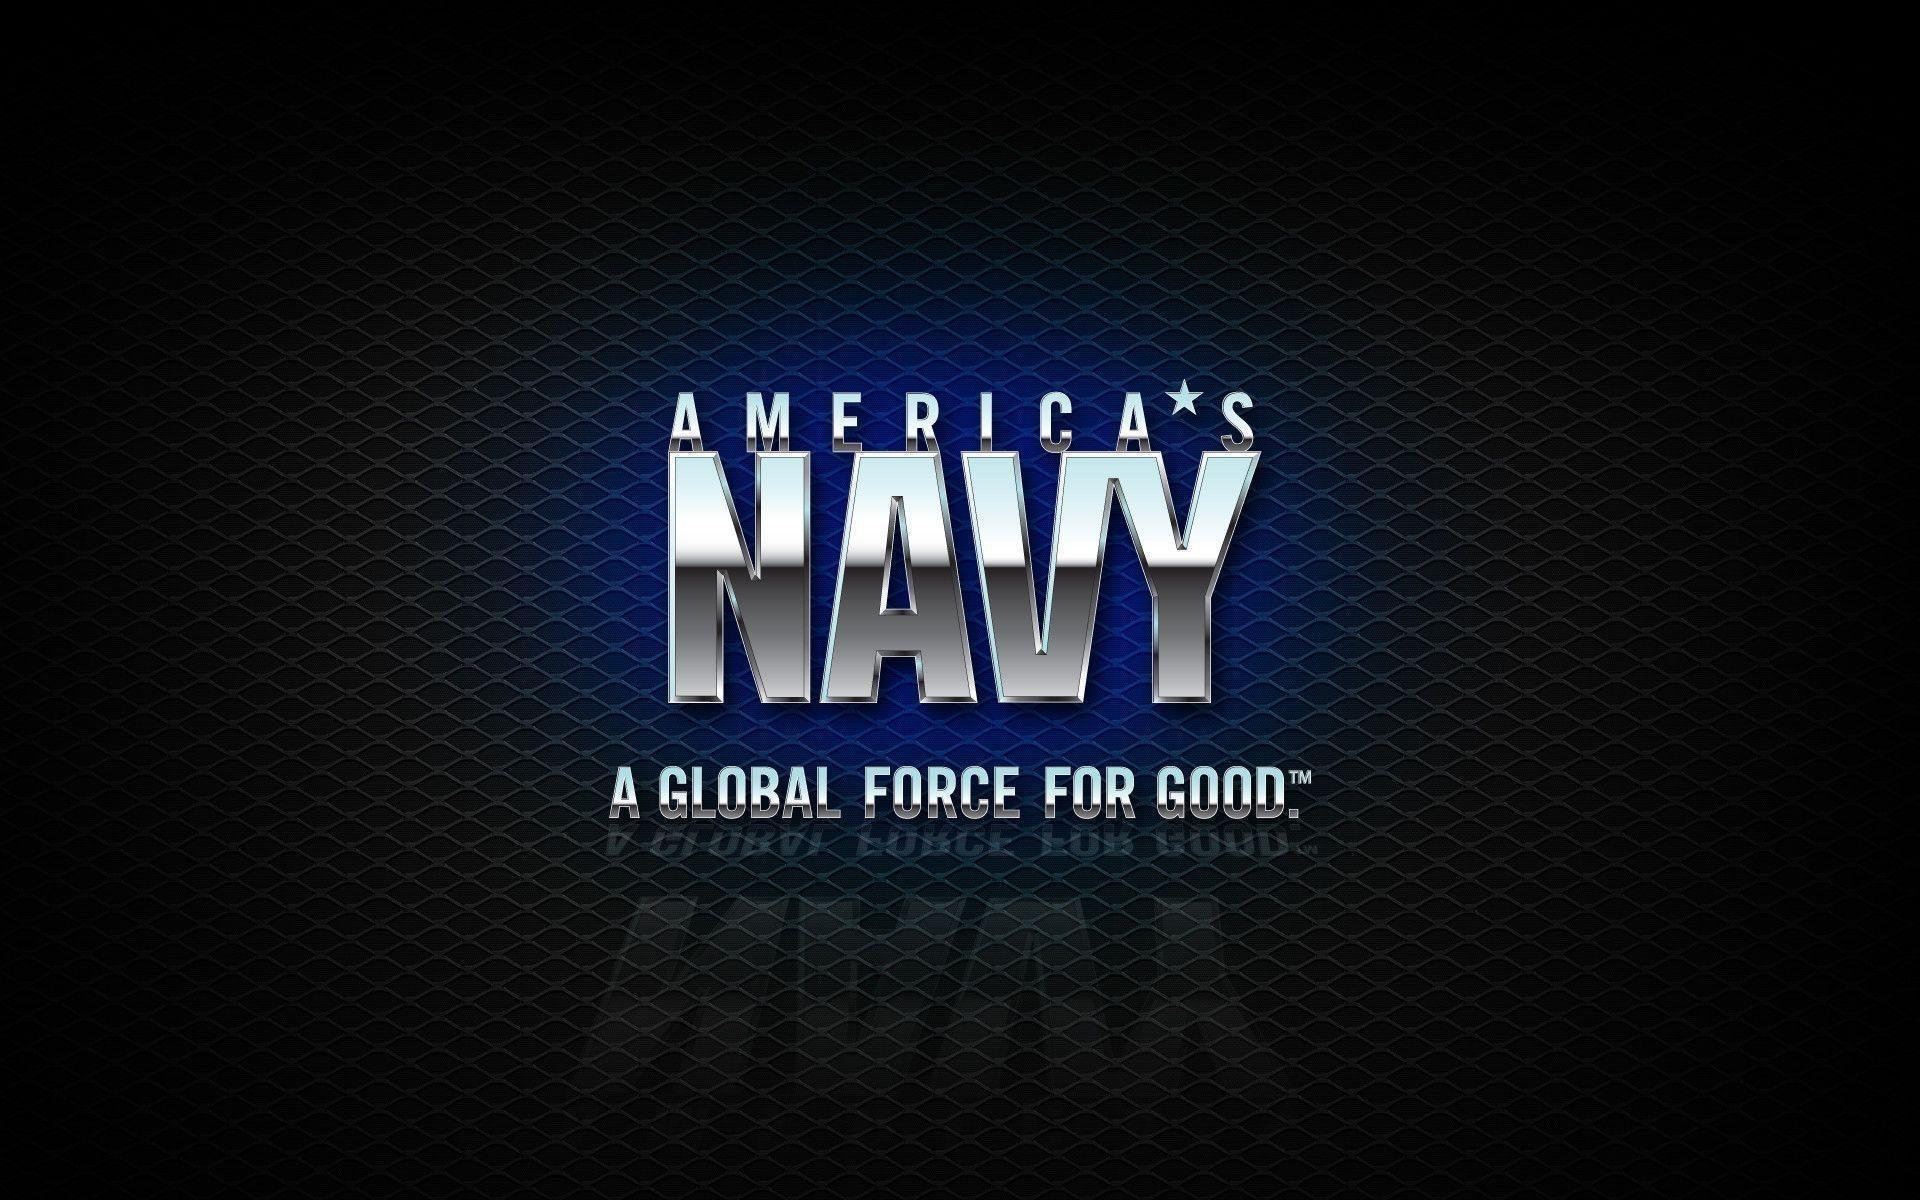 1993 navy screensavers and wallpaper